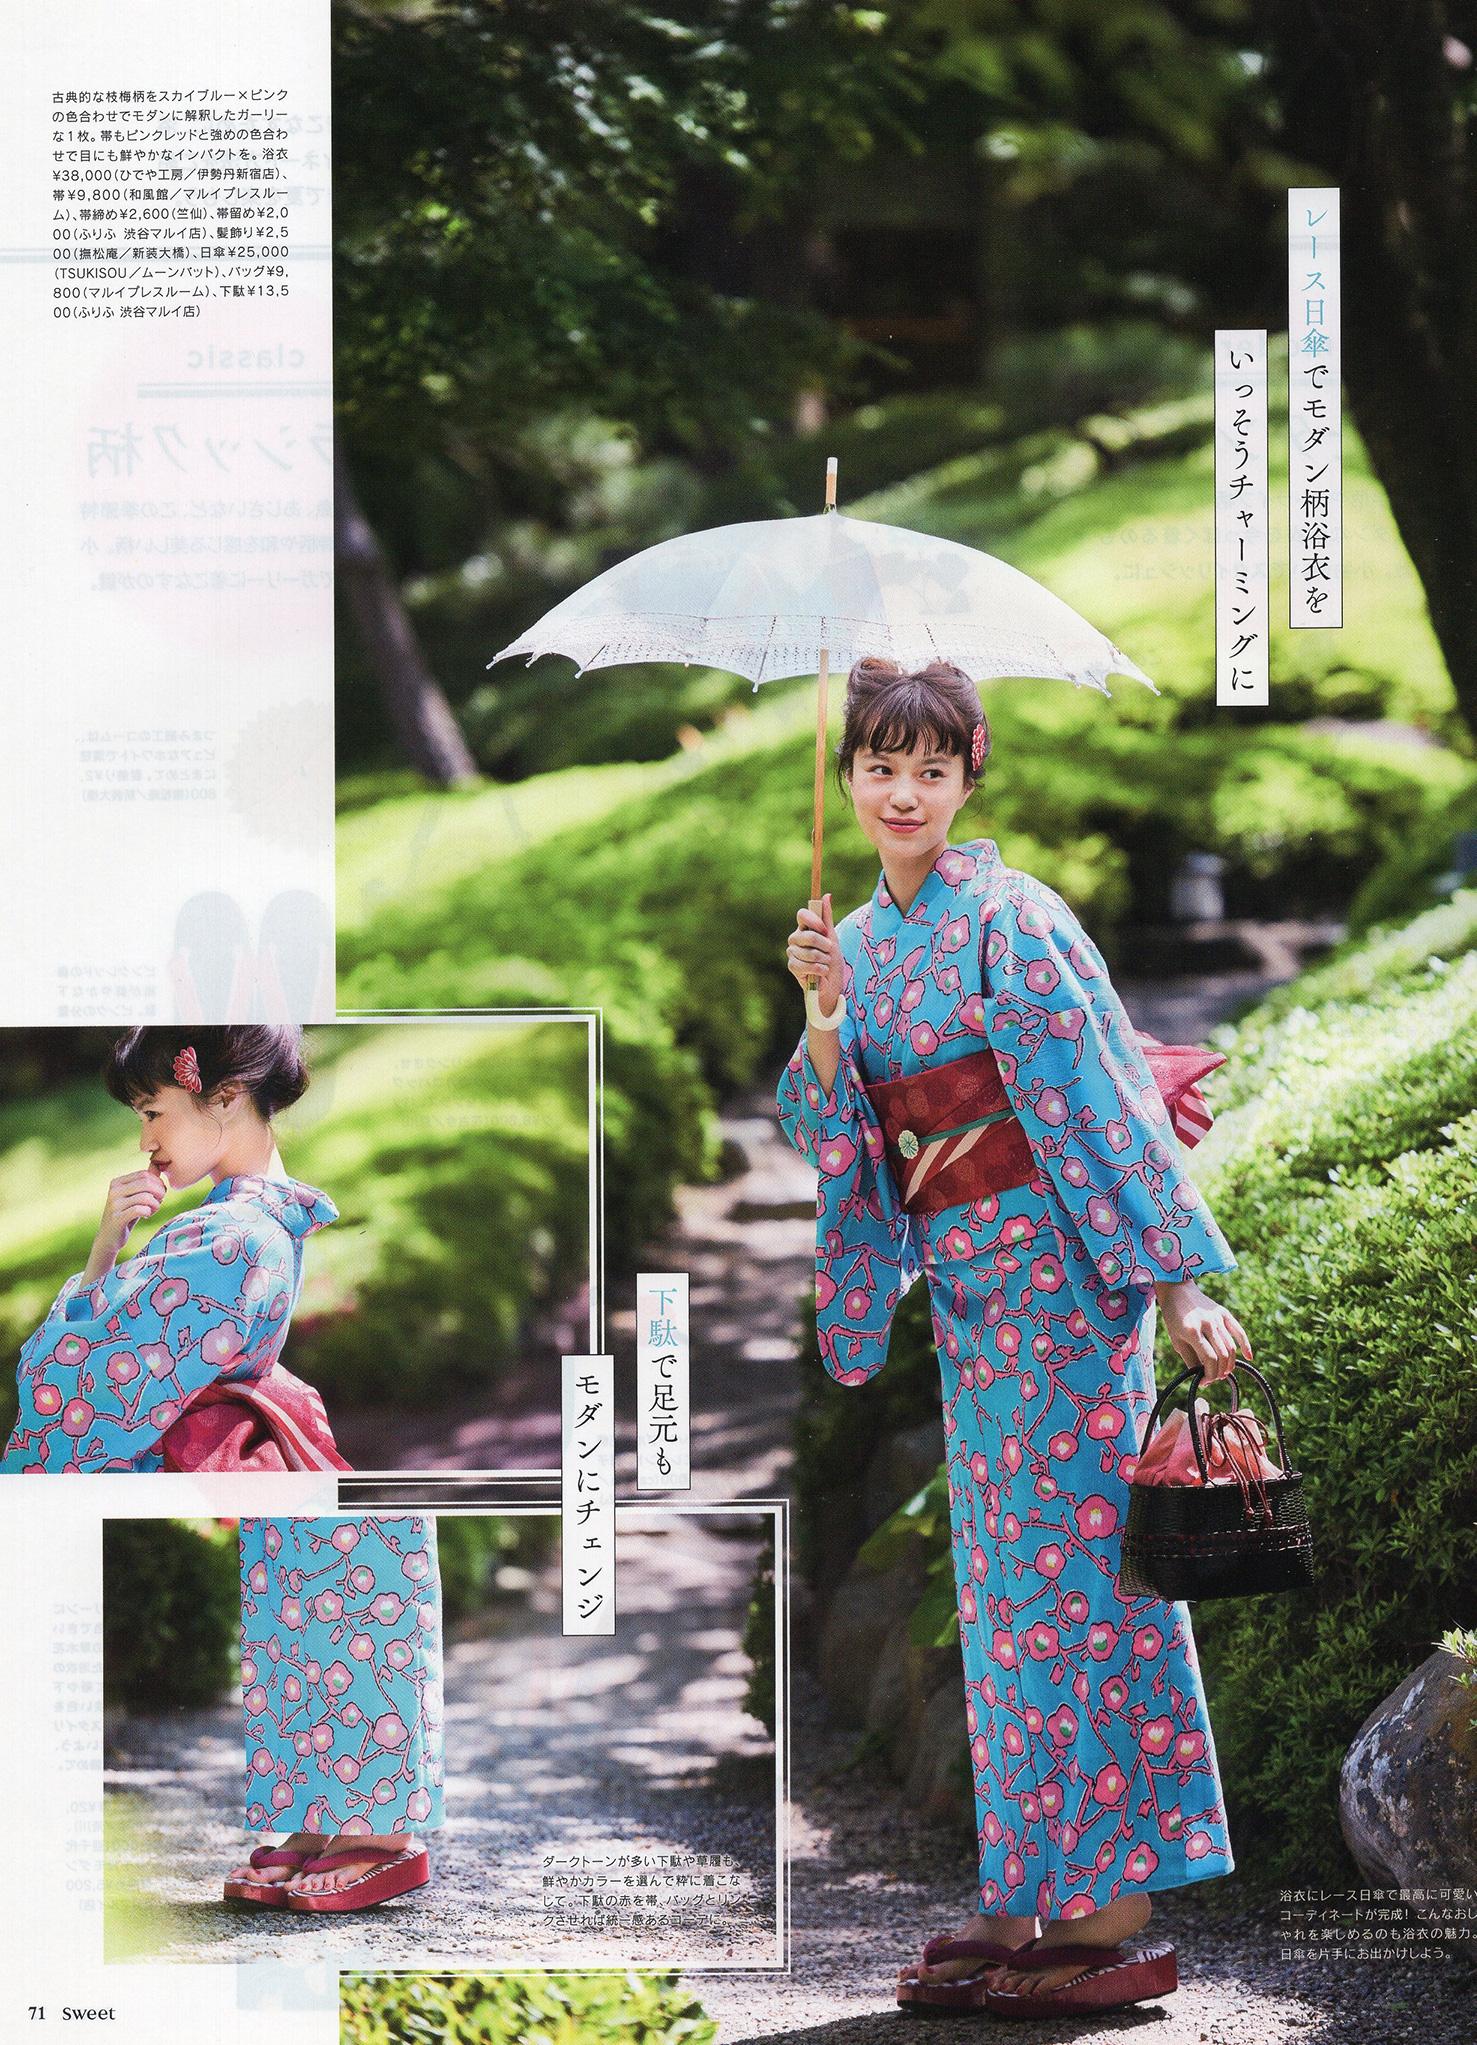 sweet 2017_7 野崎智子 浴衣